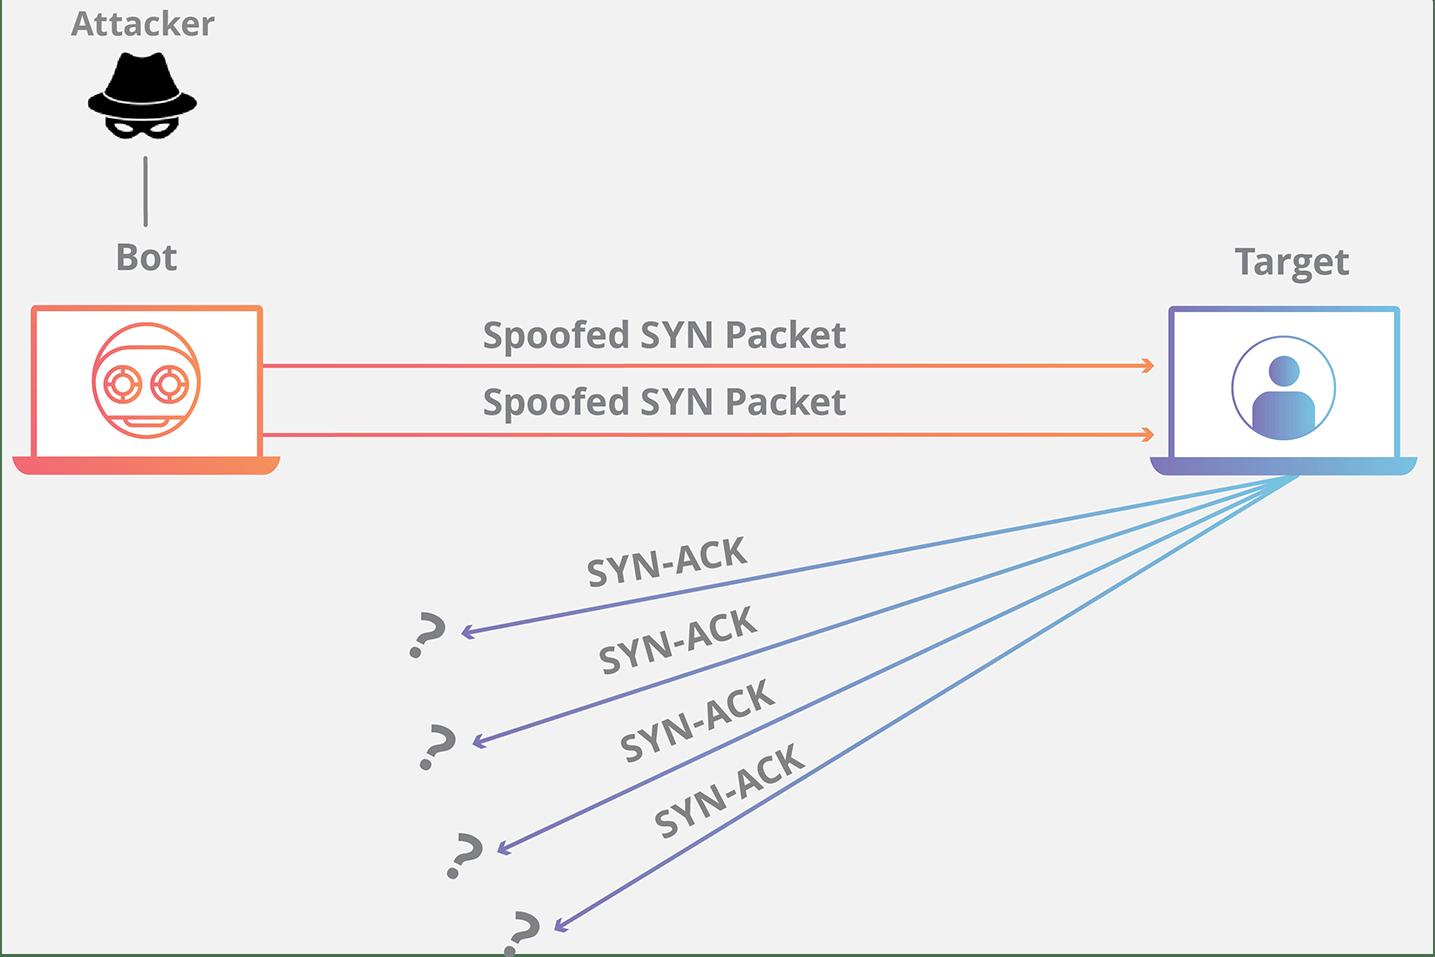 tcp three way handshake diagram dimarzio ultra jazz wiring diagrams syn flood ddos attack cloudflare animation